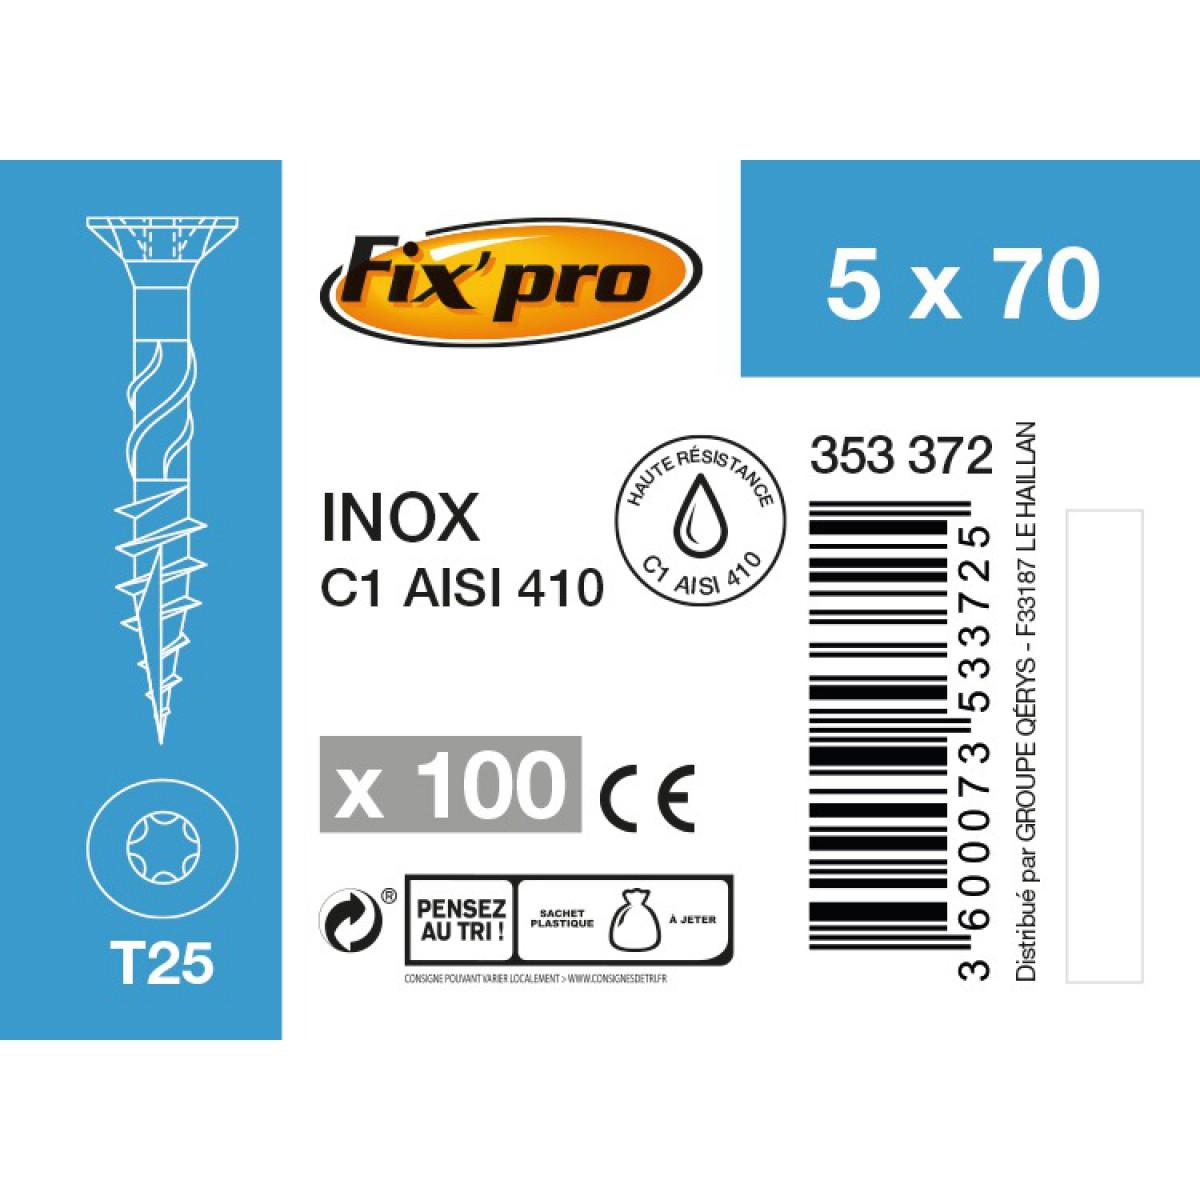 Vis terrasse inox C1 - 5x70 - 100pces - Fixpro